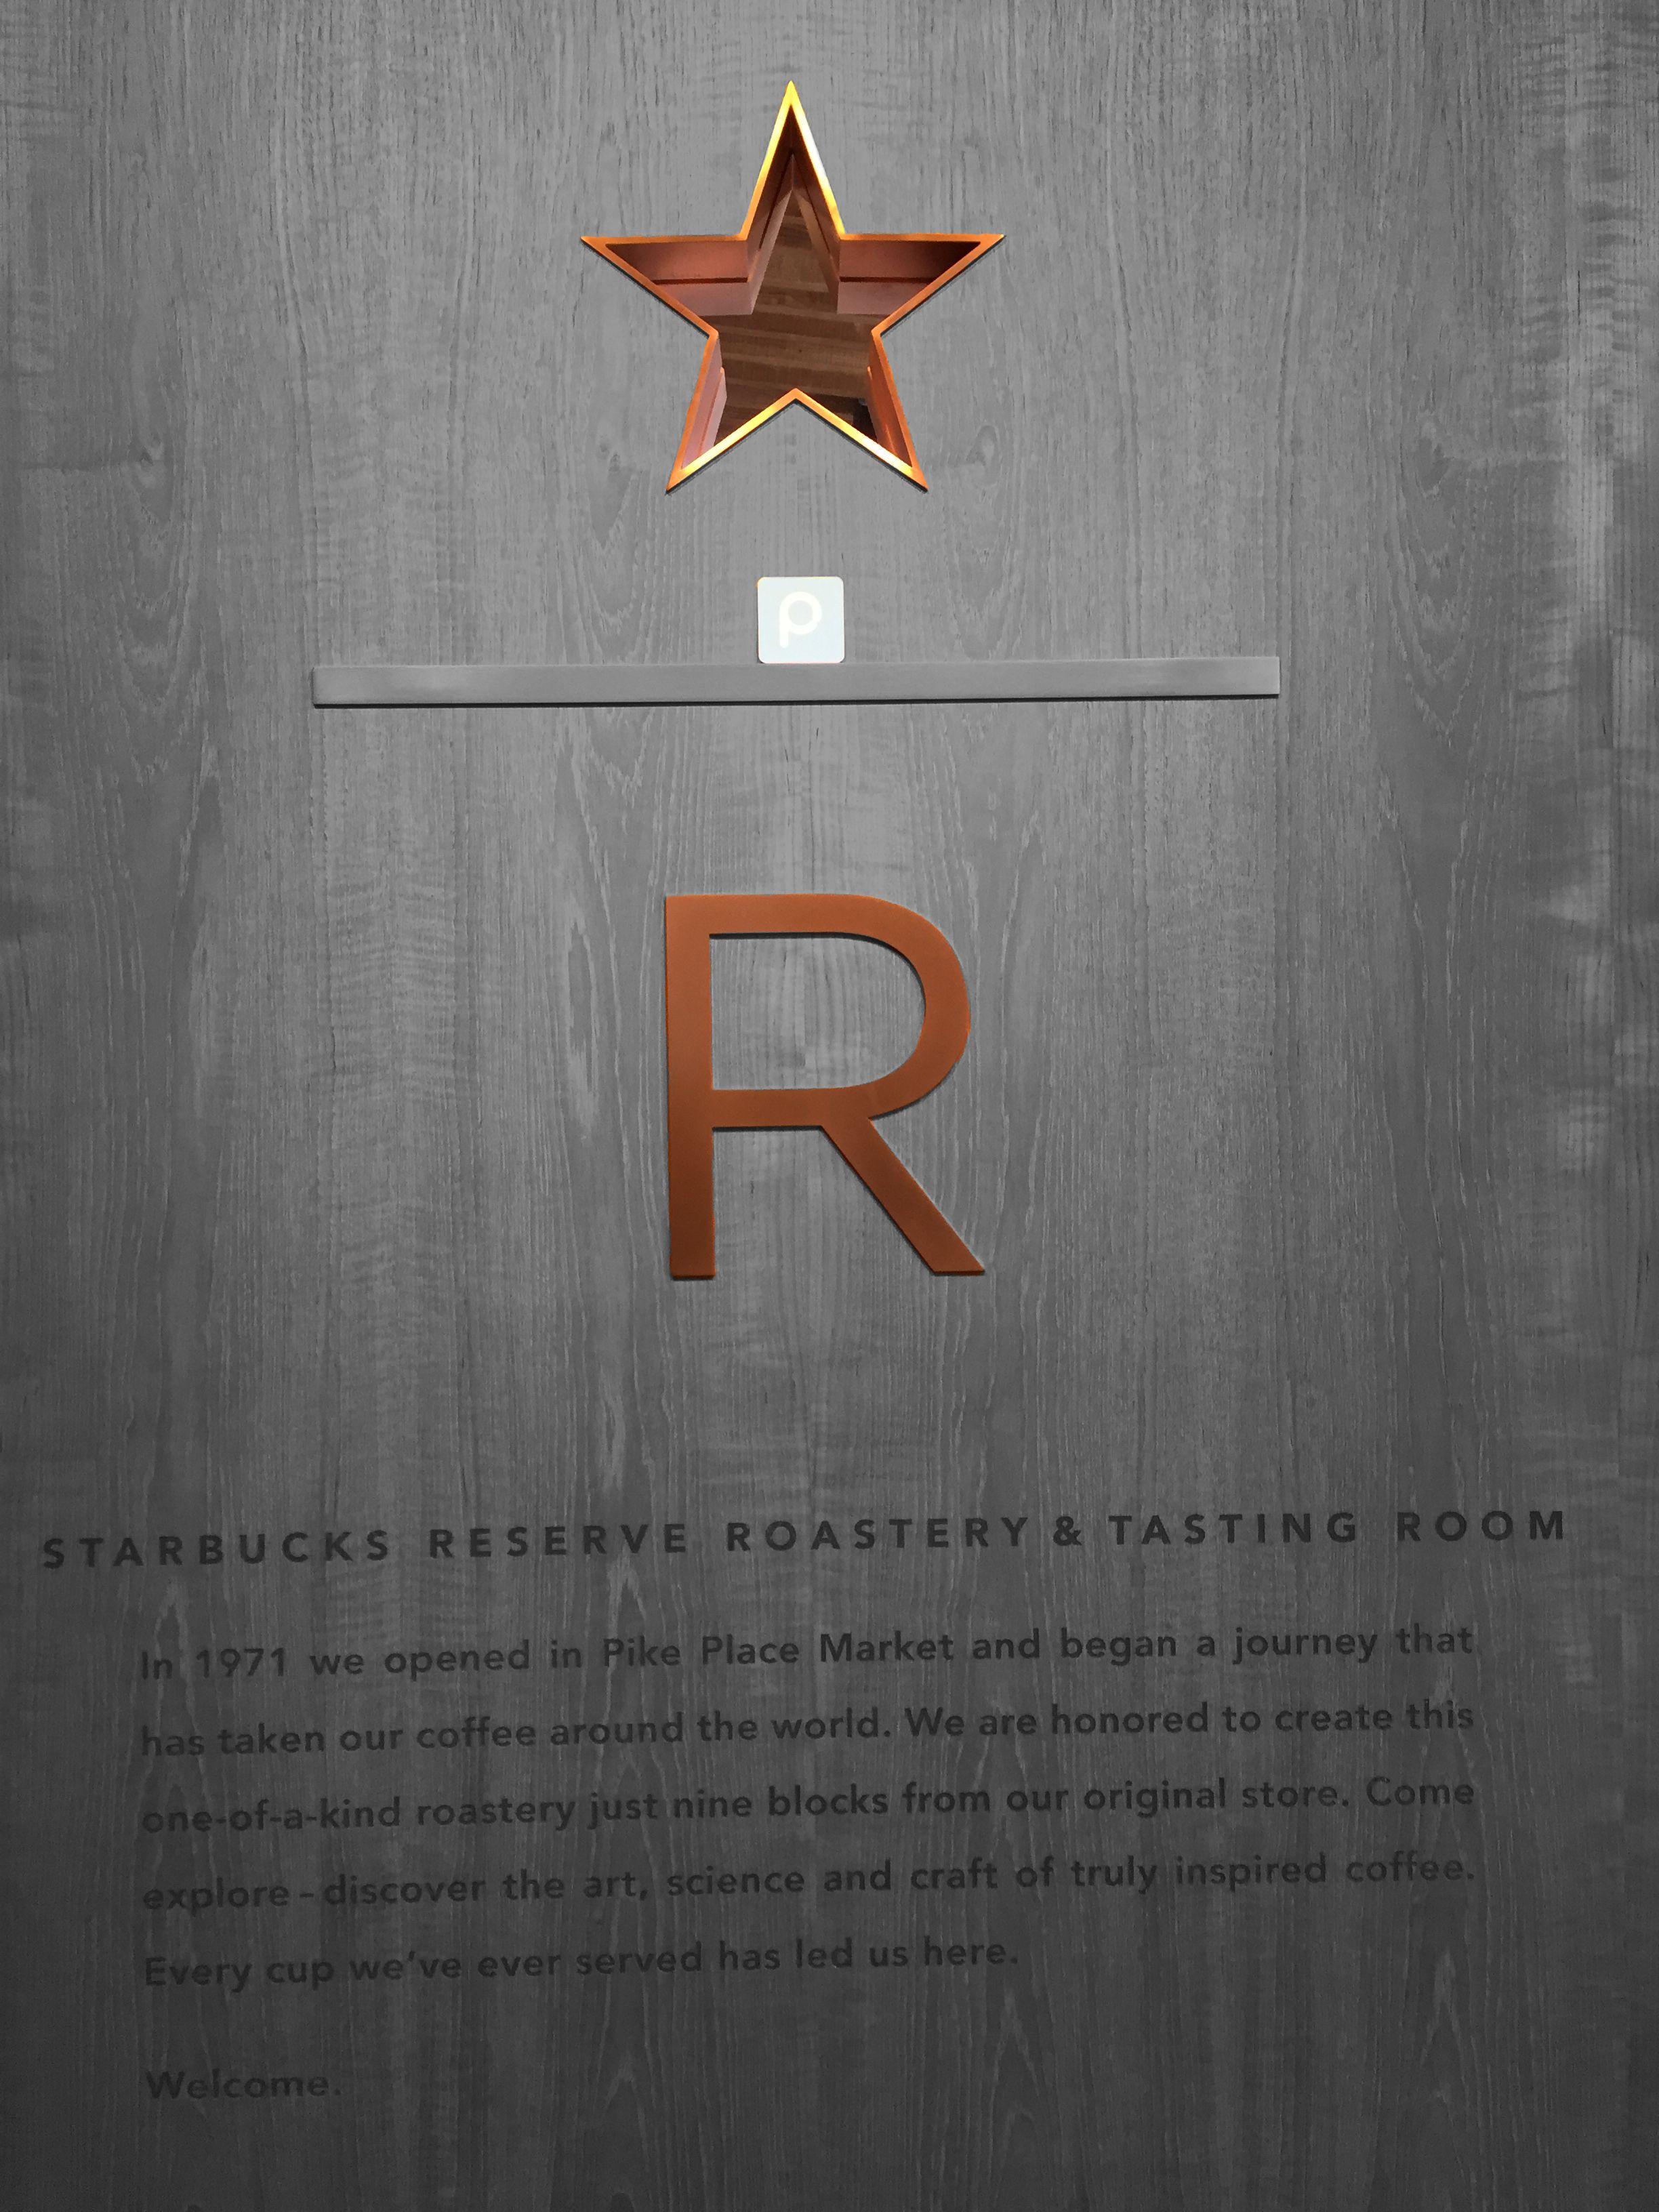 The Starbucks Reserve Roastery Tasting Room Love